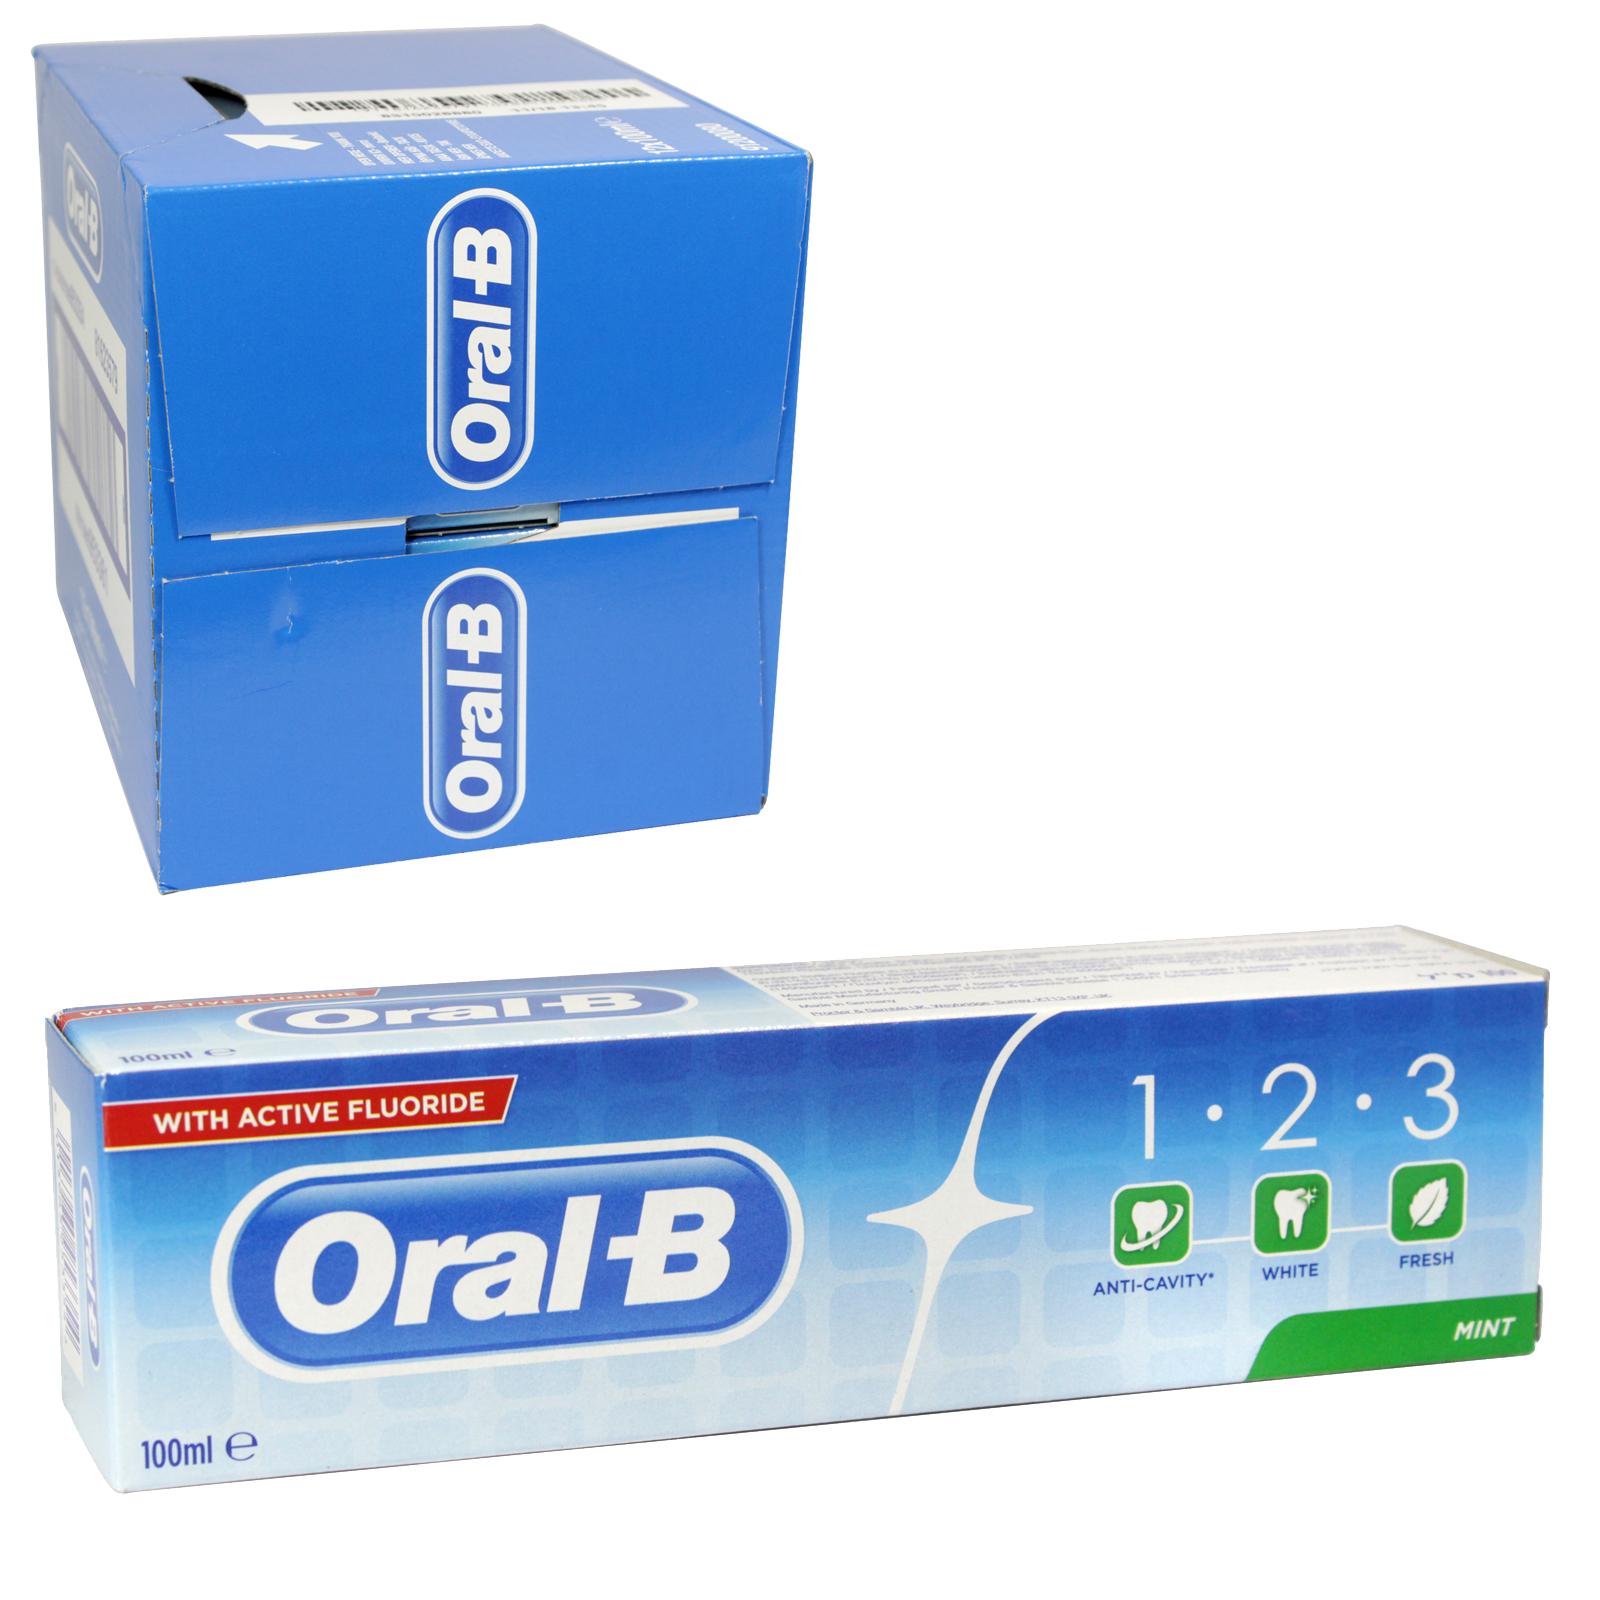 ORAL B TOOTHPASTE 1-2-3 100ML MINT X12